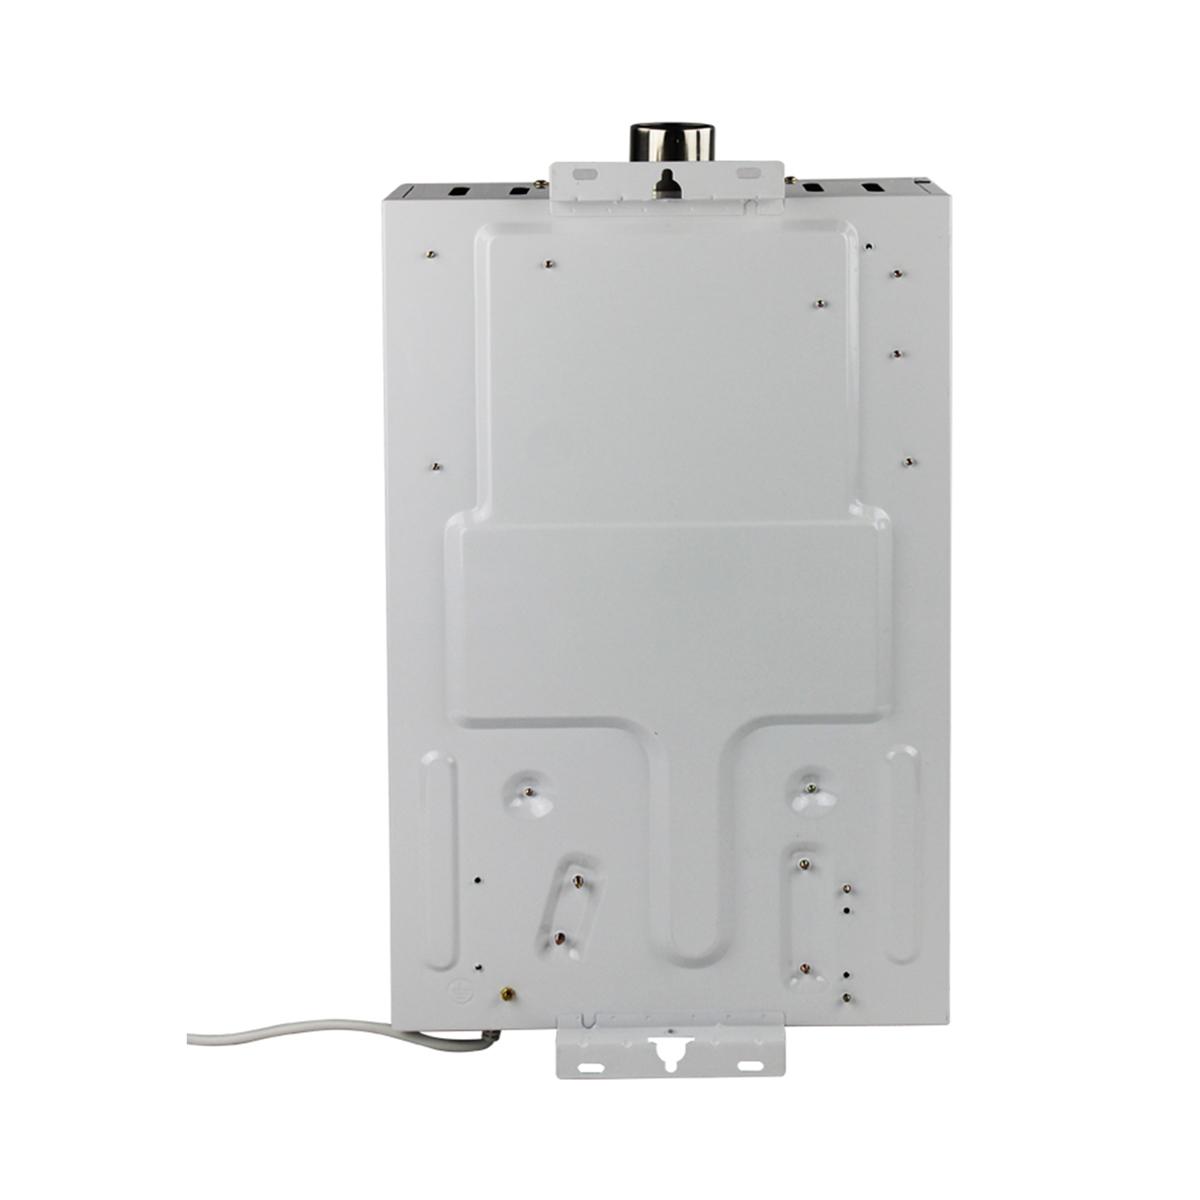 Midea/美的 JSQ30-16HC7 燃气热水器 说明书.pdf